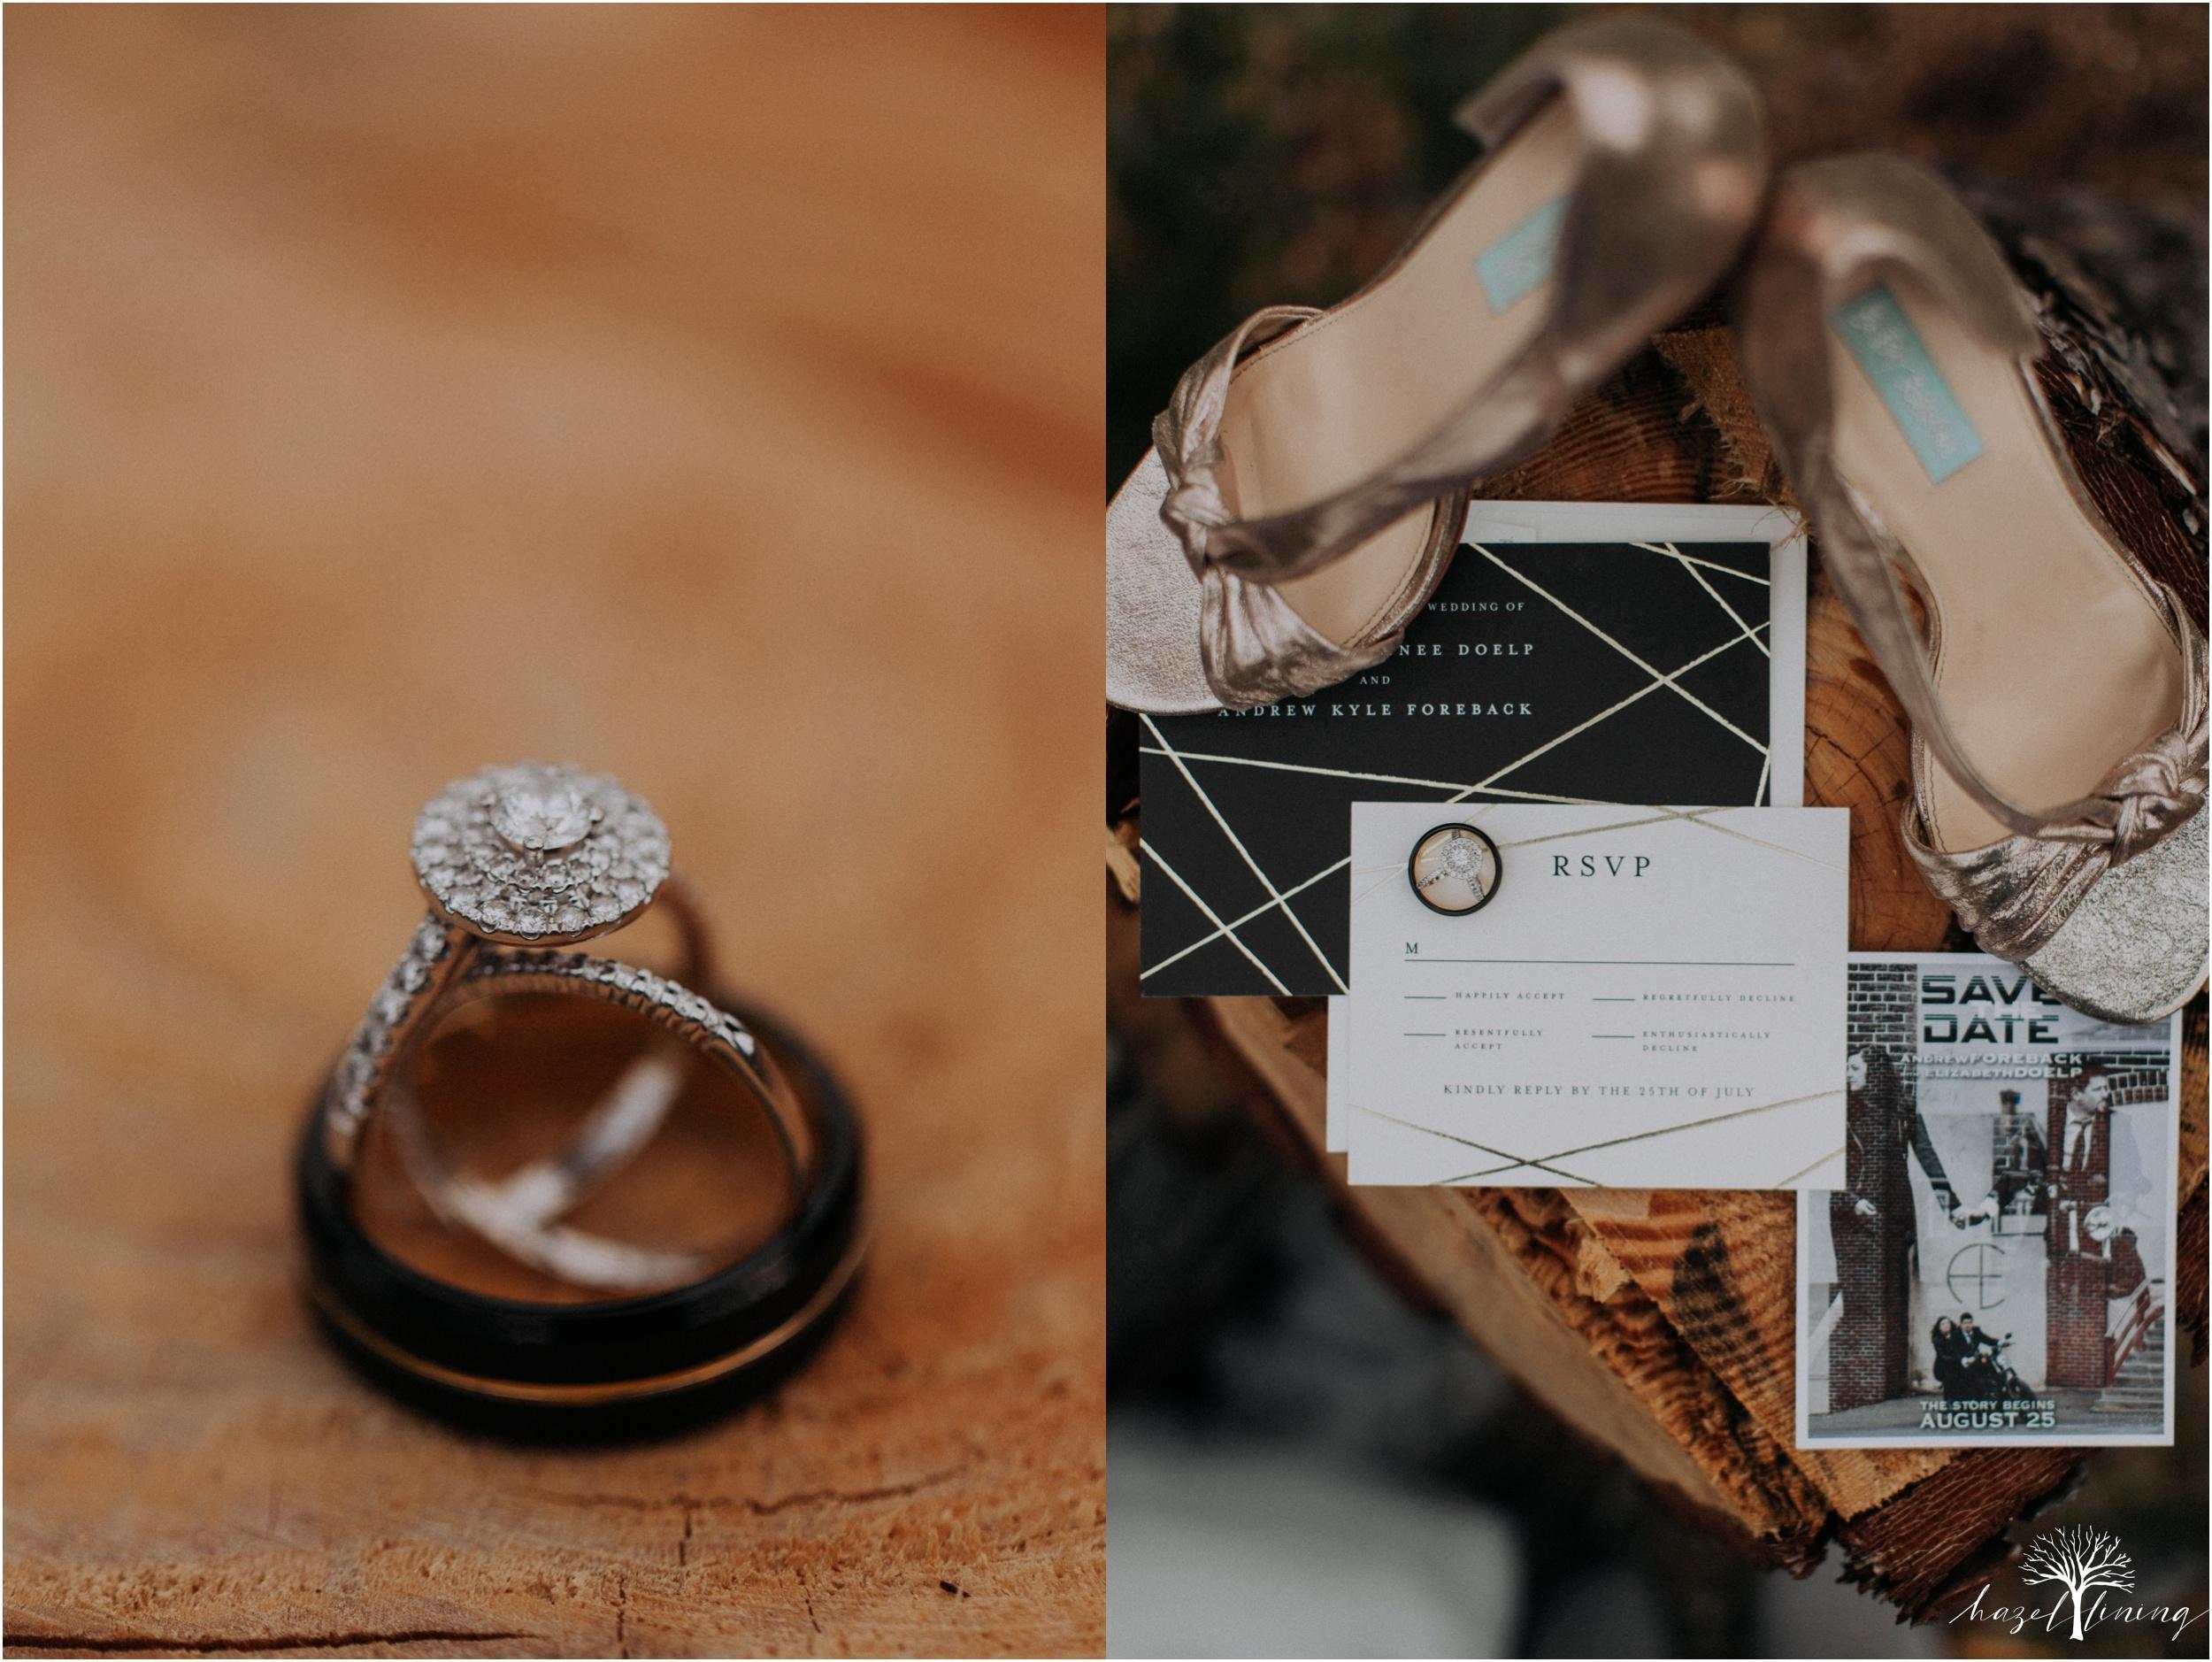 elizabeth-doelp-andrew-foreback-middletown-country-club-summer-langhorne-pennsylvania-wedding-hazel-lining-travel-wedding-elopement-photography_0002.jpg